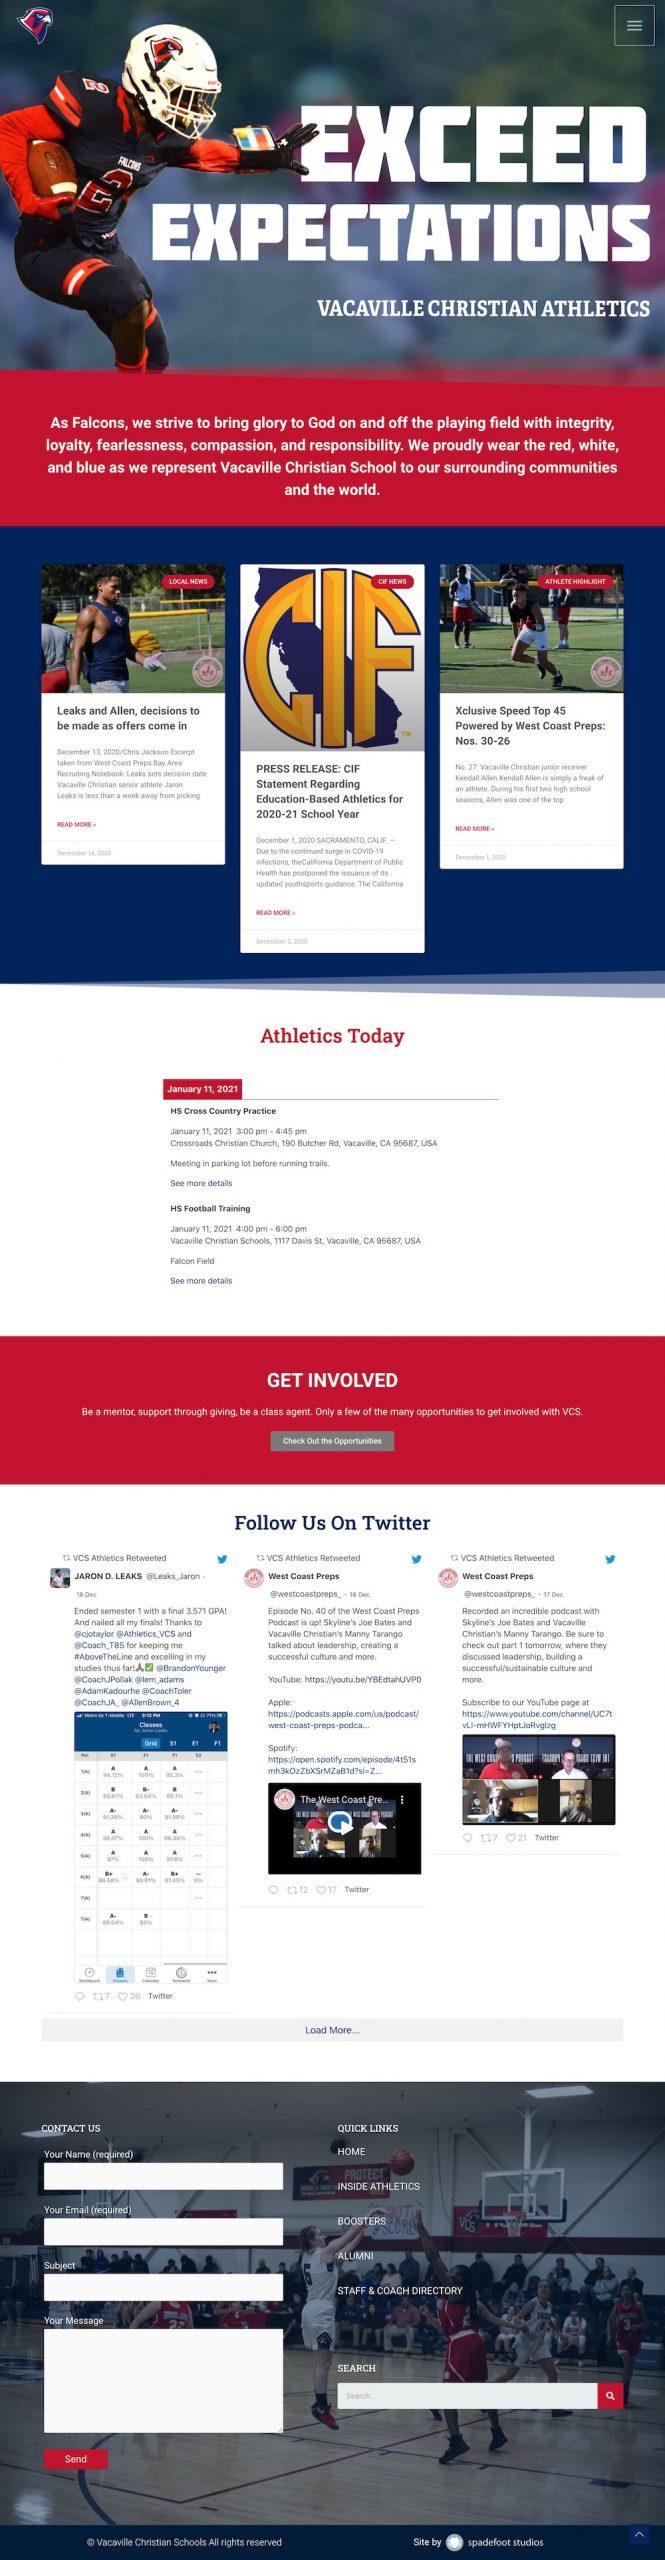 VCS homepage screenshot